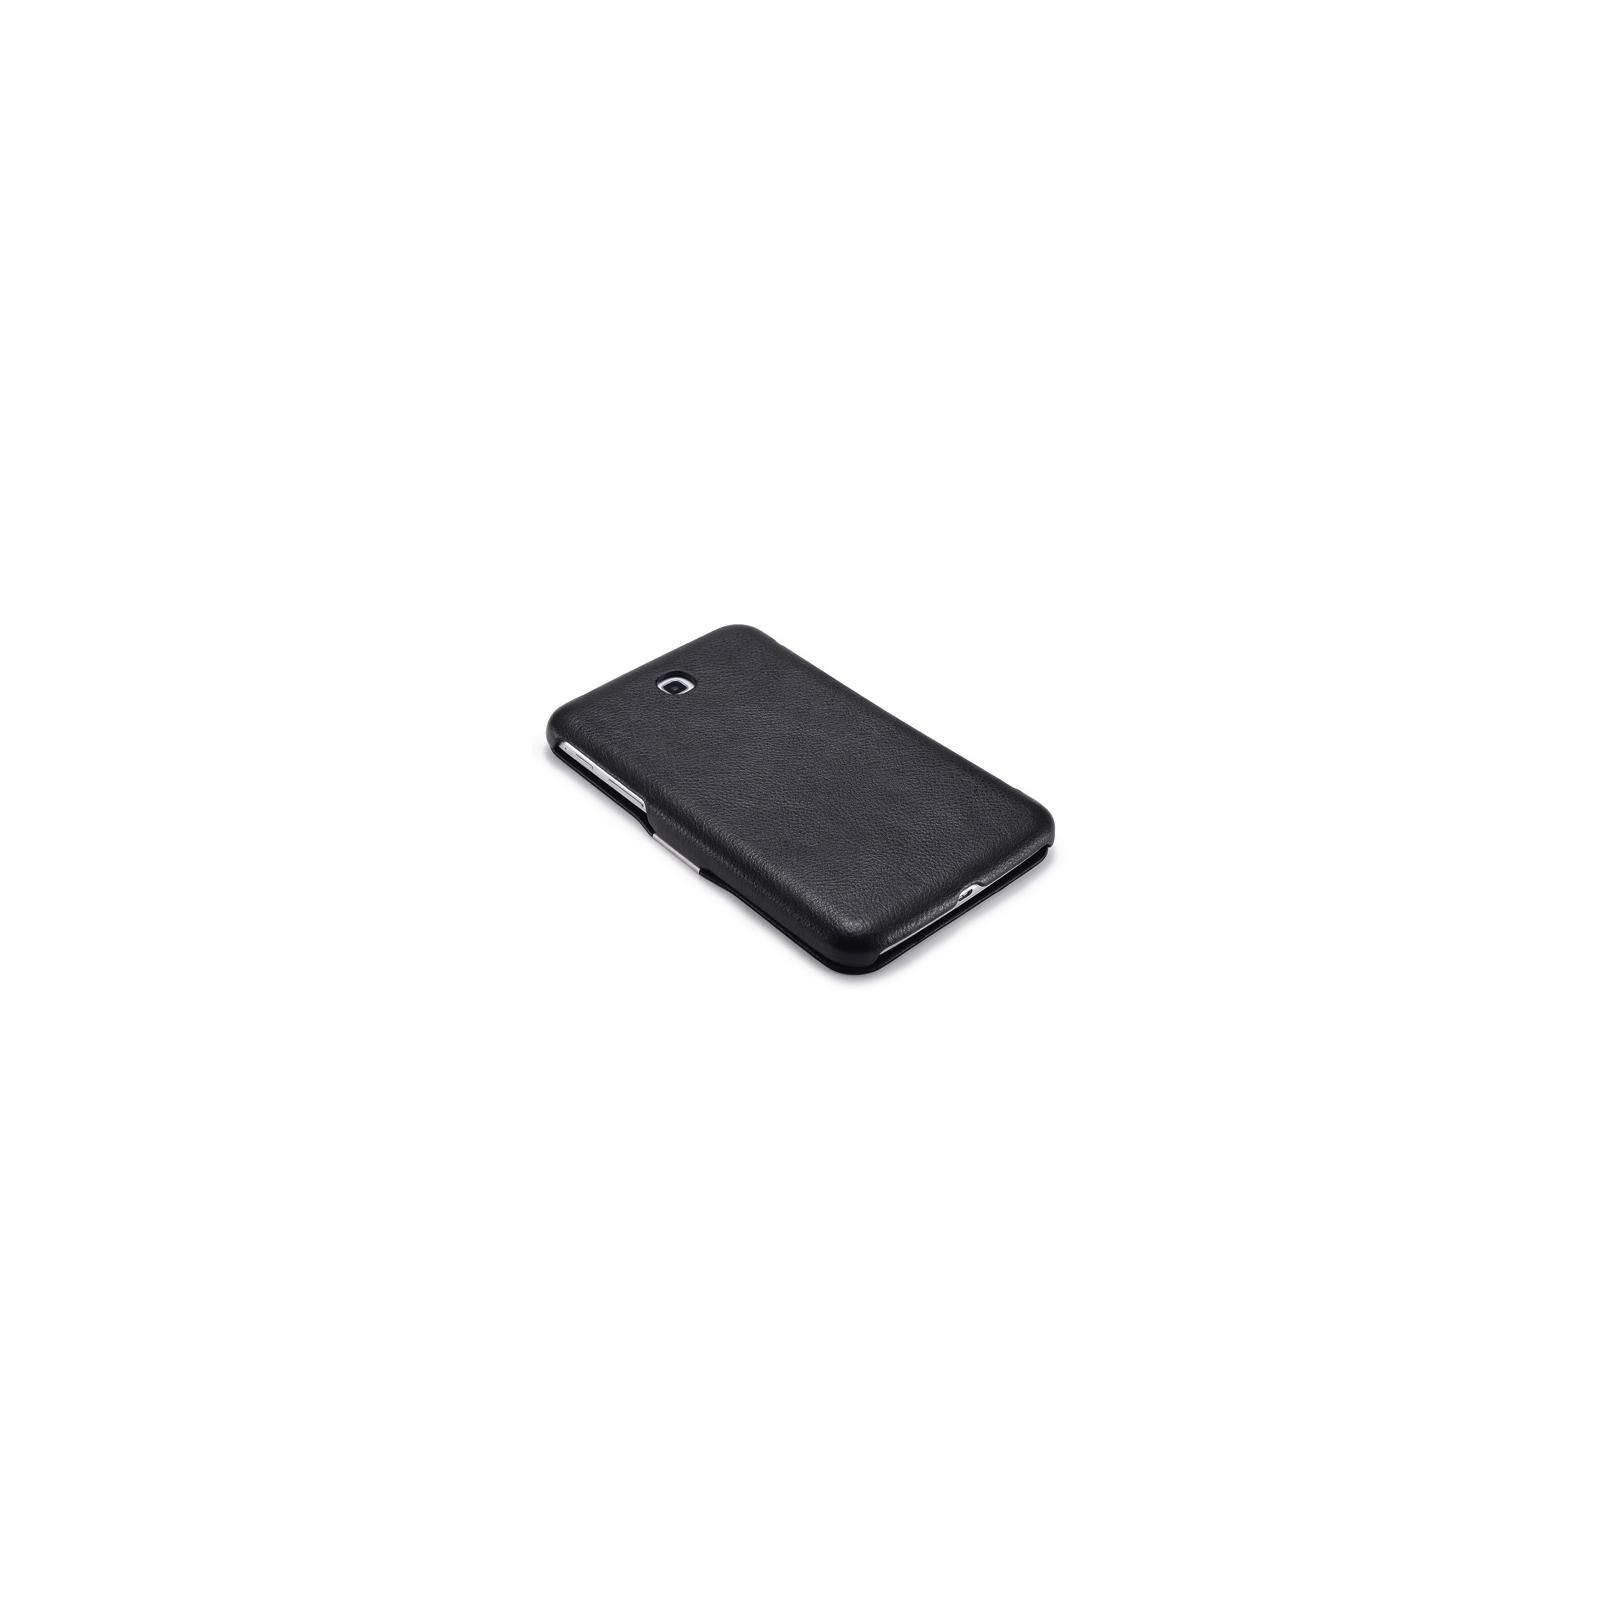 "Чехол для планшета i-Carer 7"" Samsung Galaxy Tab 3 7.0 T2100/P3200 шкіряний (RS320001 Black) изображение 4"